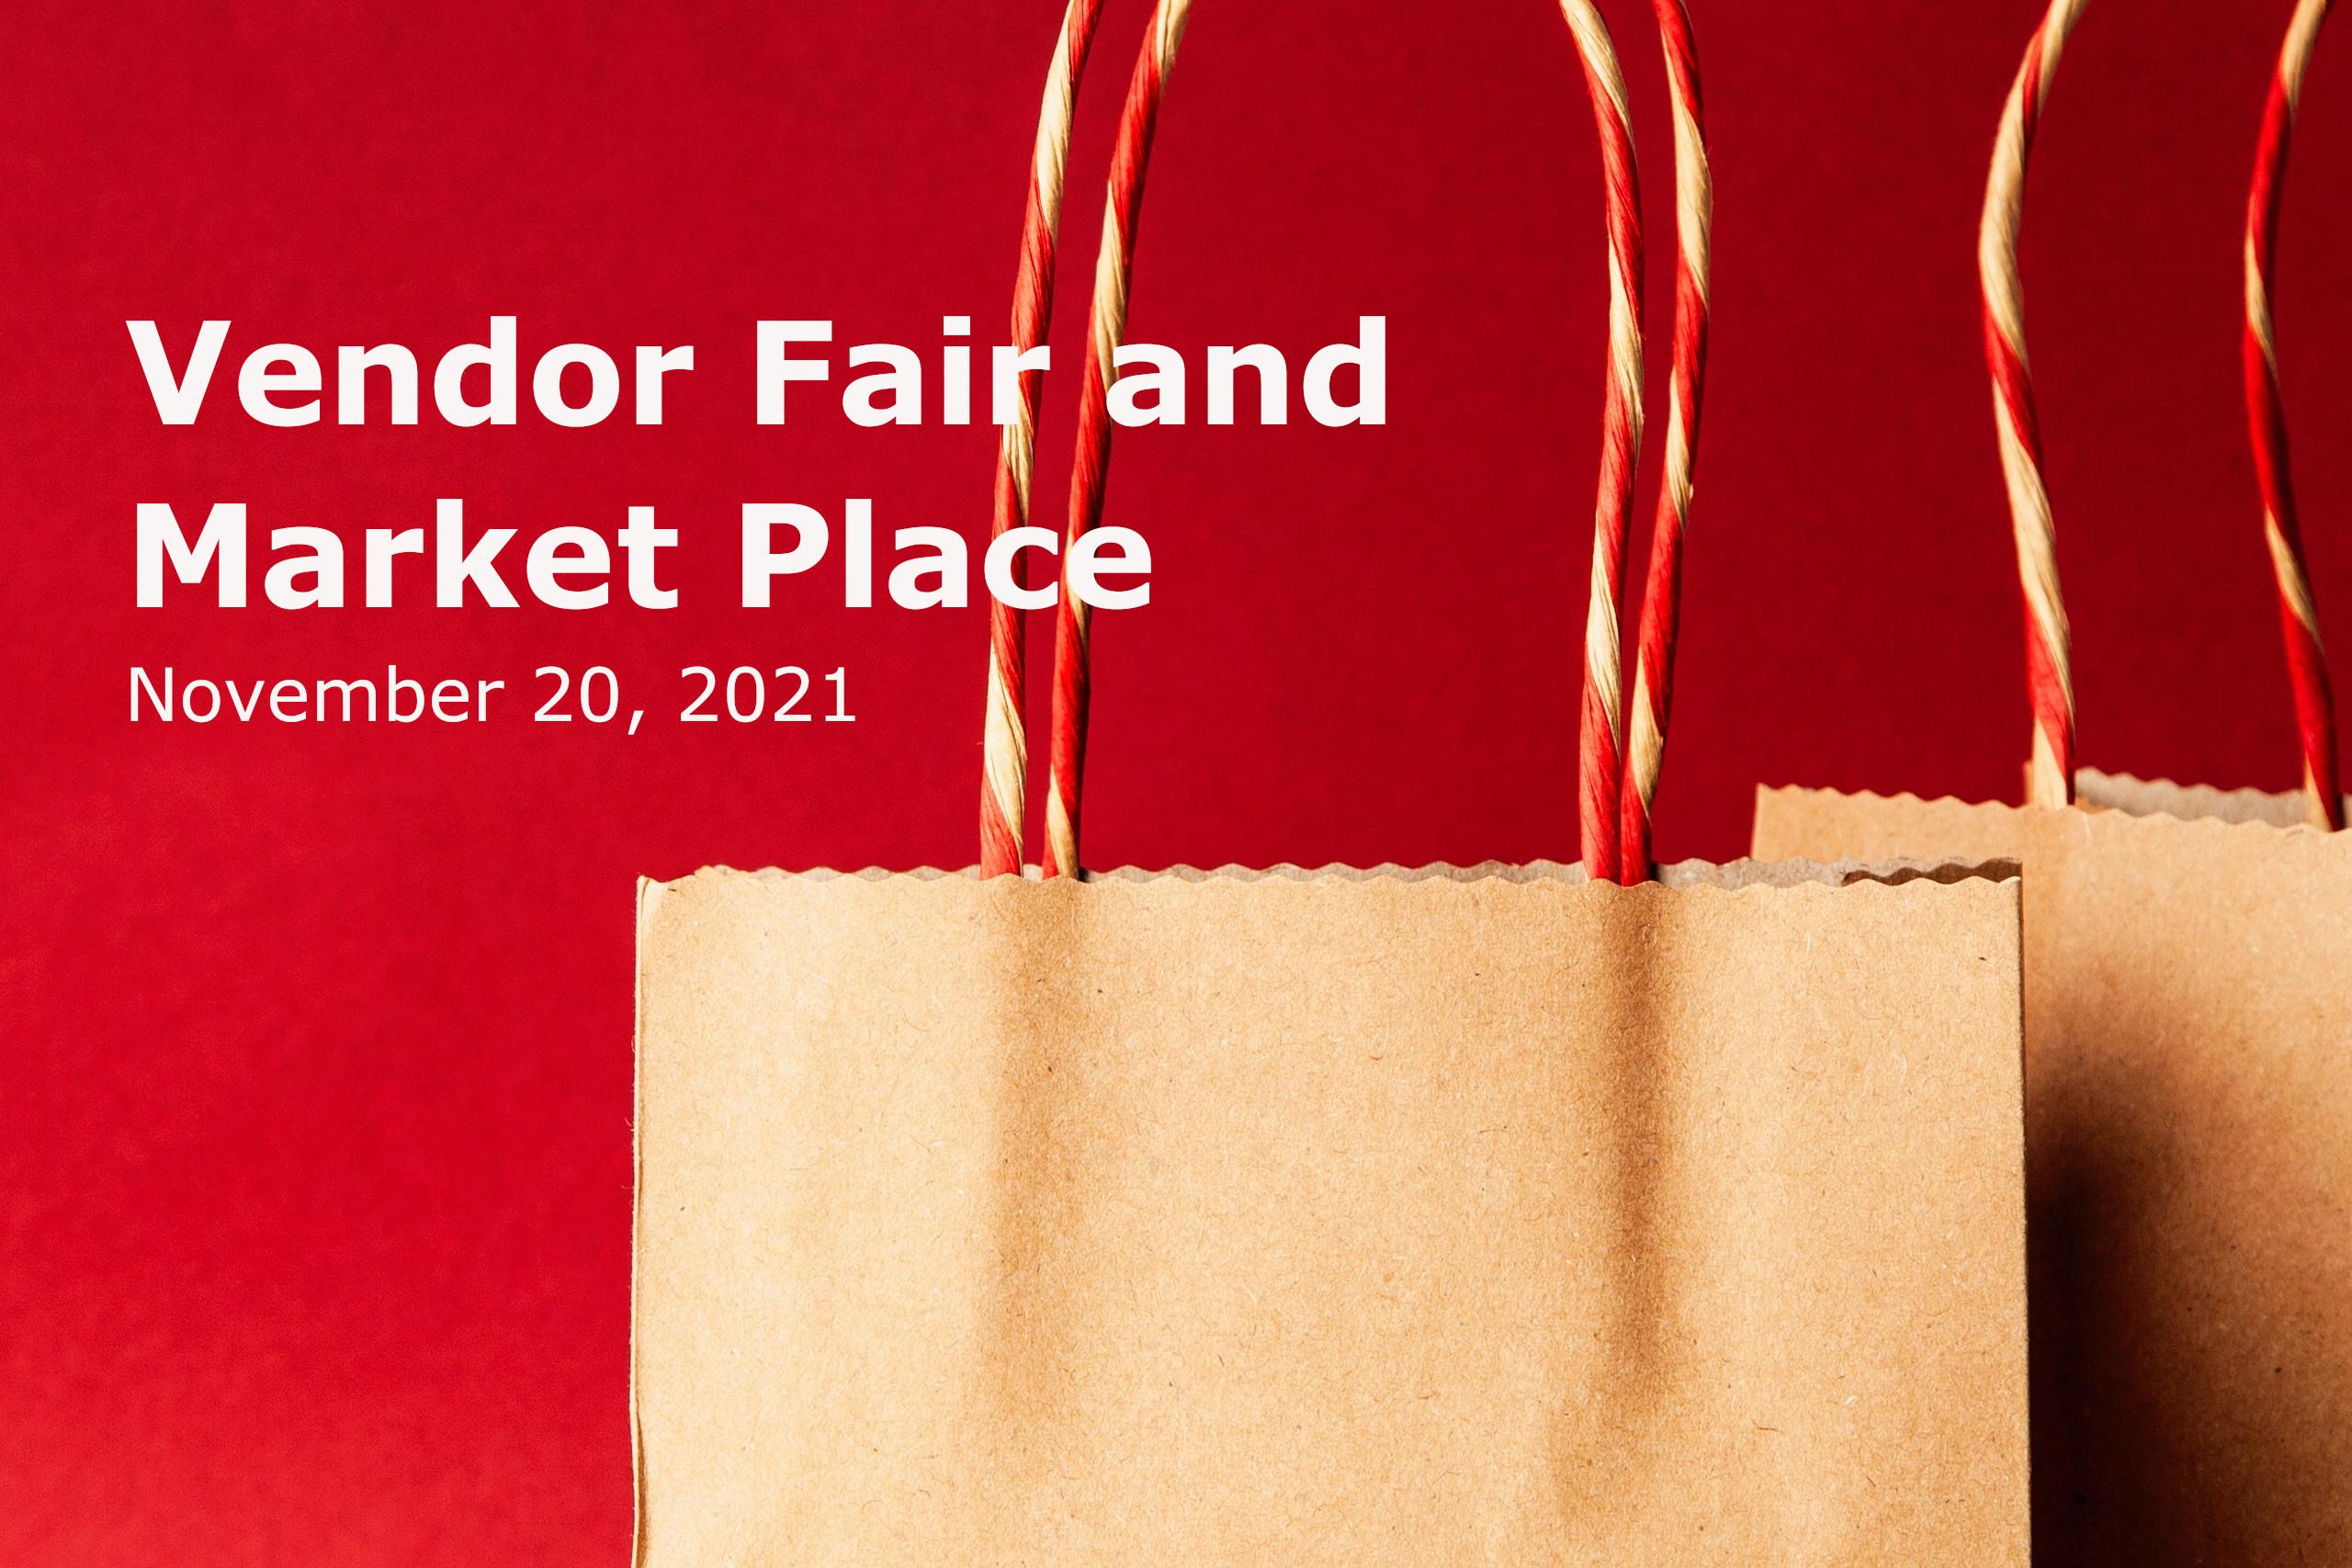 Vendor Fair and Market Place